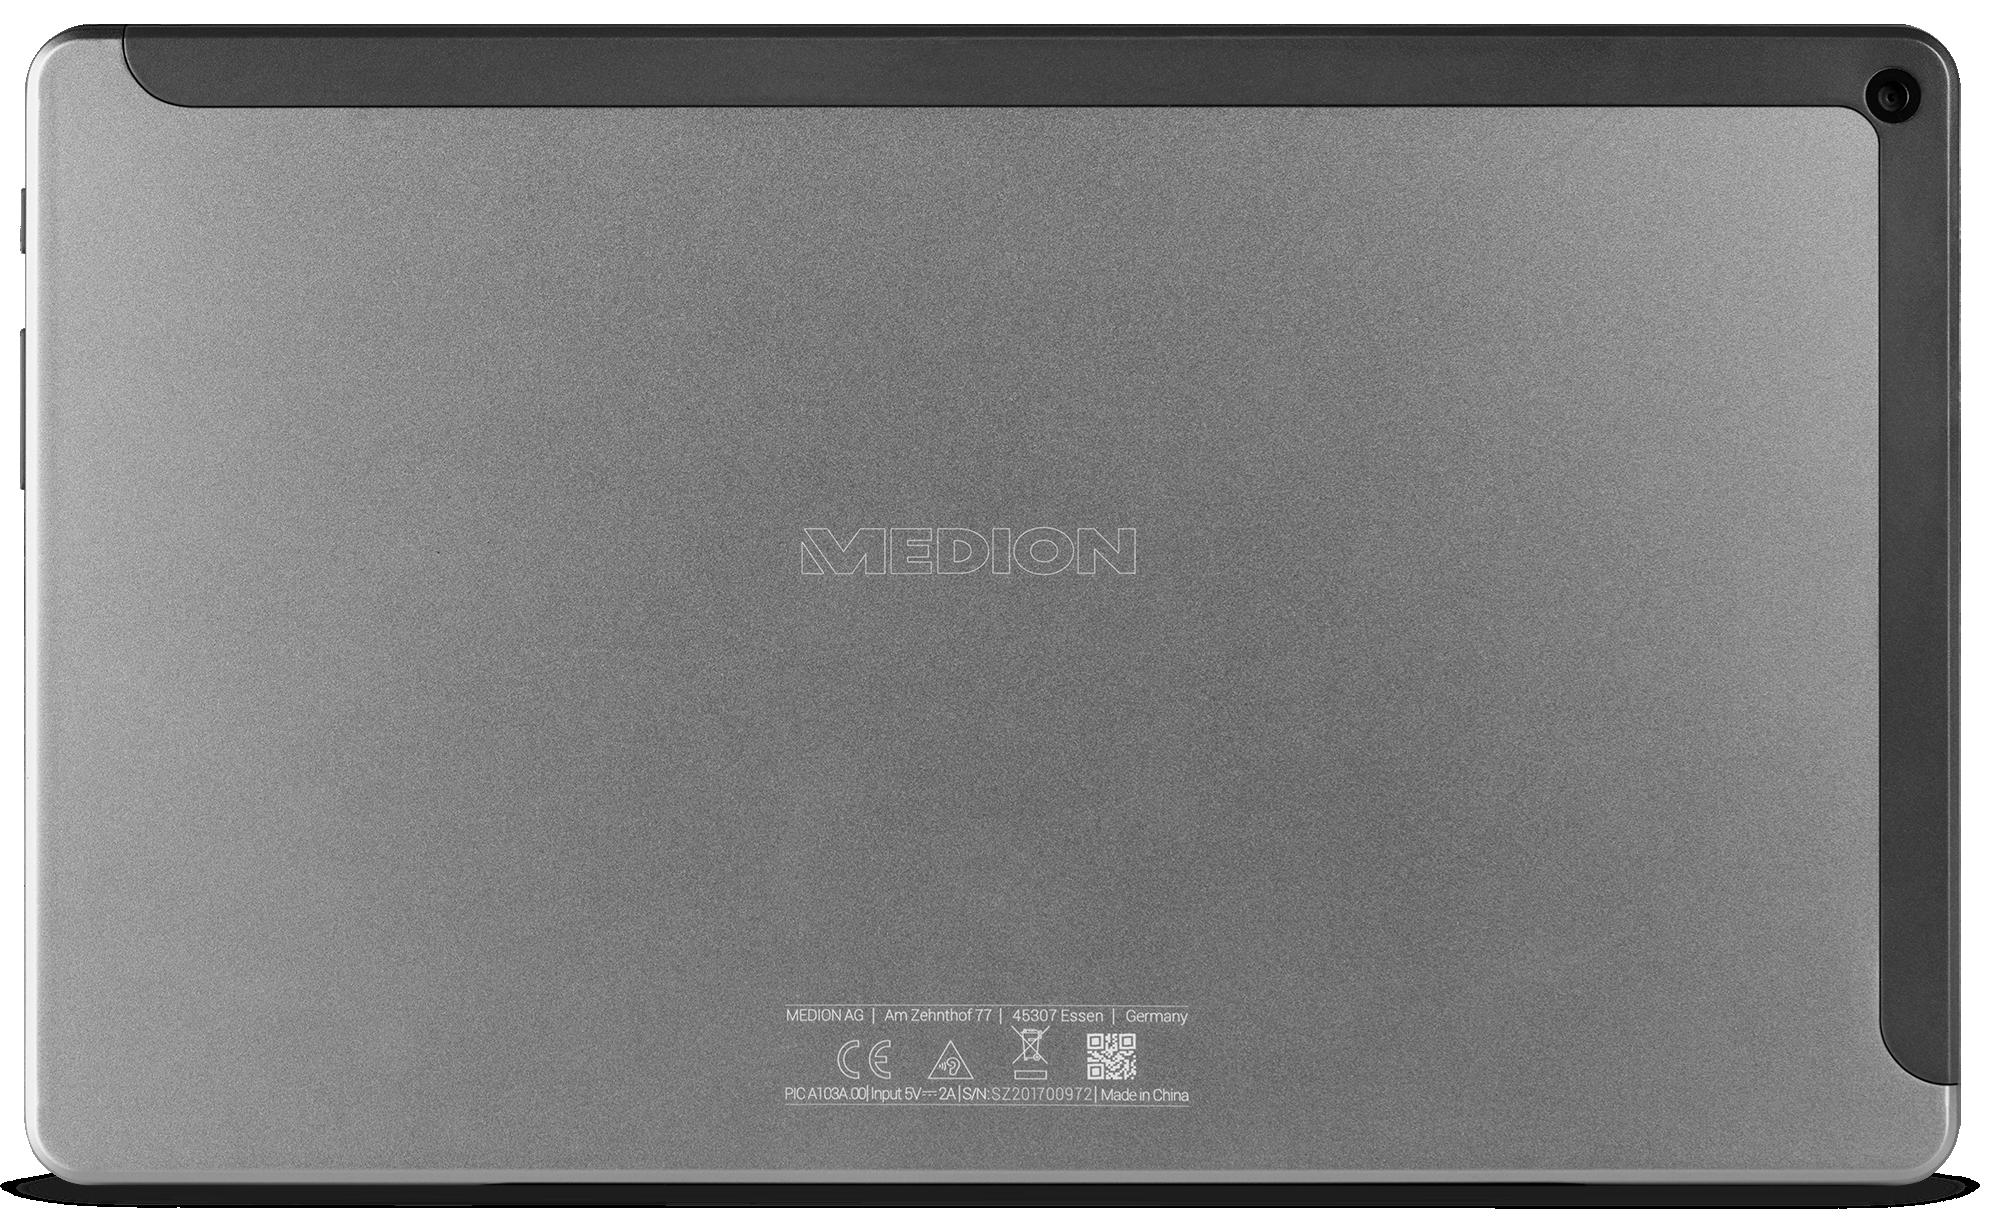 Achterzijde X10605